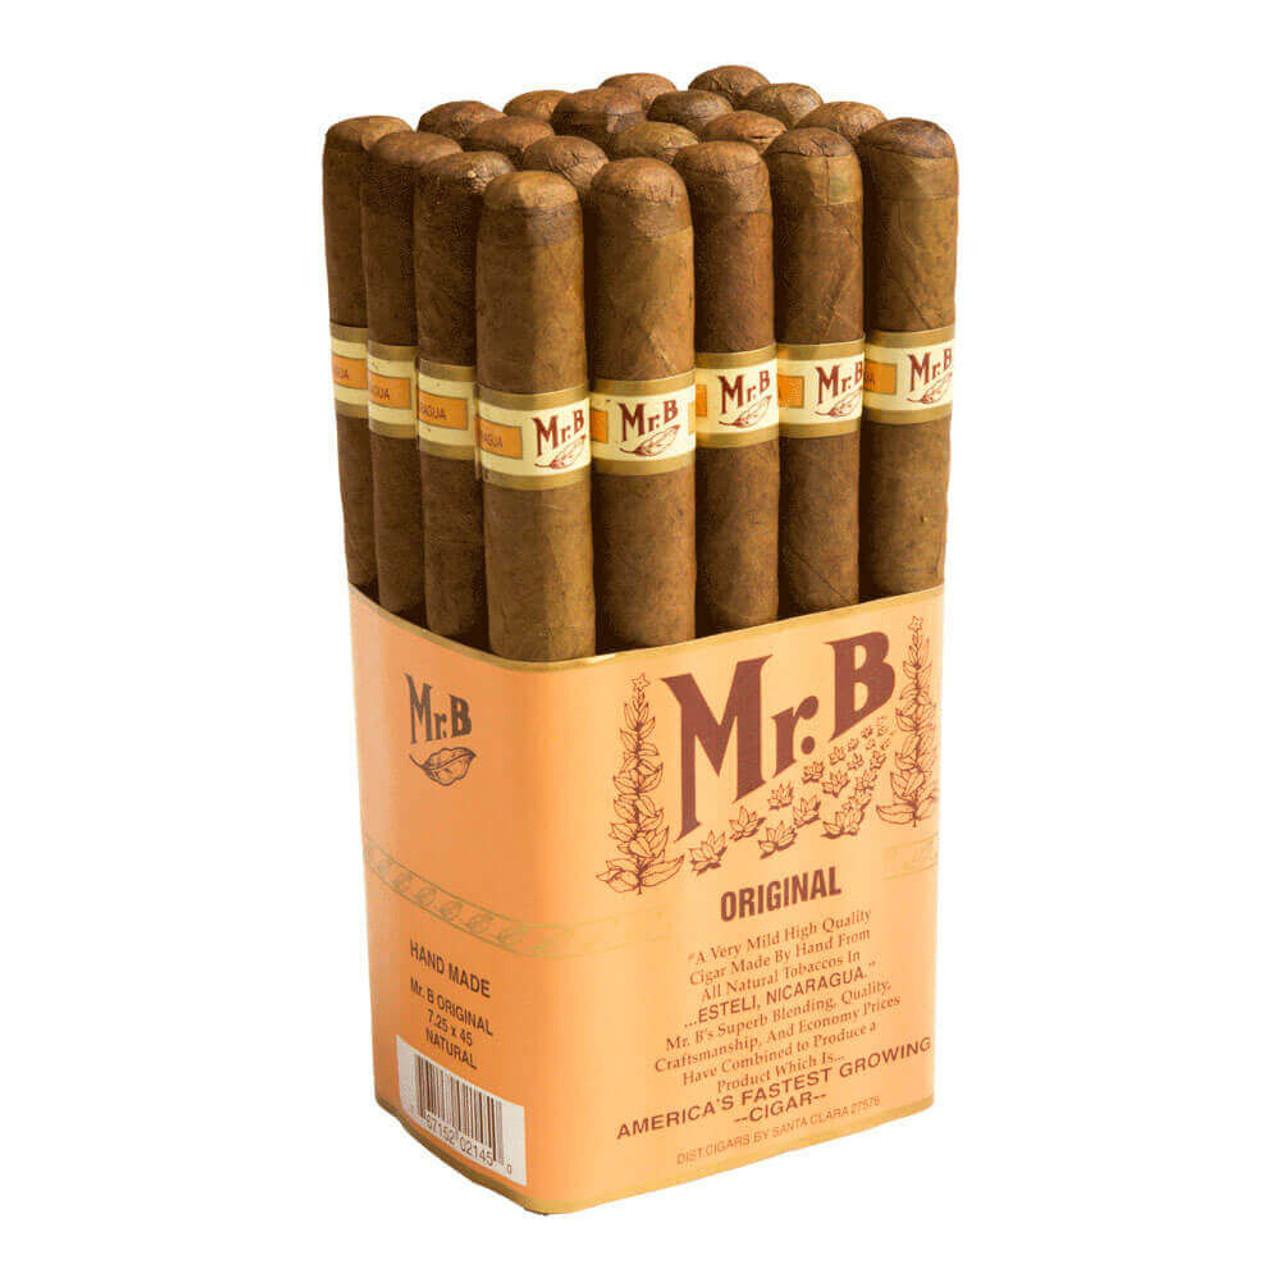 Mr. B Original Cigars - 7.25 x 45 (Bundle of 20)